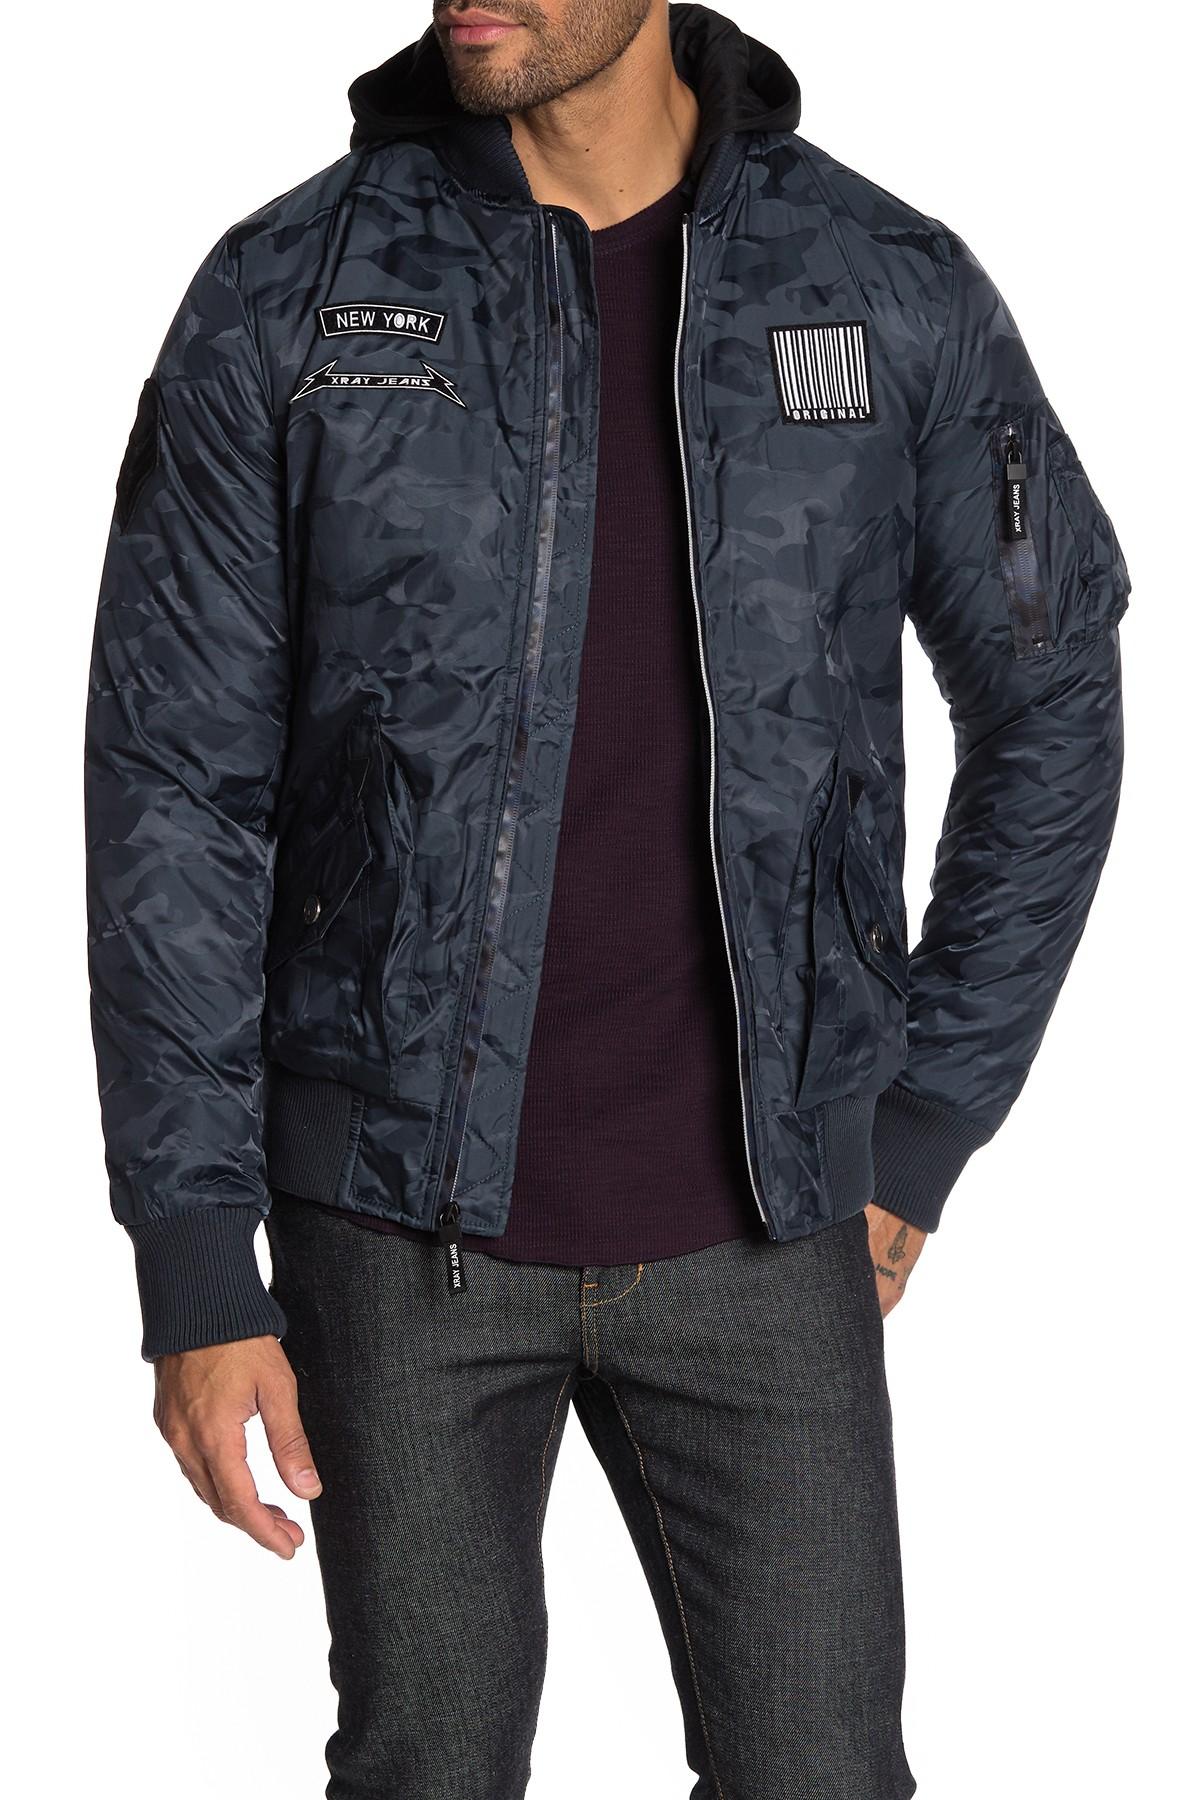 Men's XRAY Hooded Nylon Jacket (2 colors) $22.50 + Free Shipping on $89+